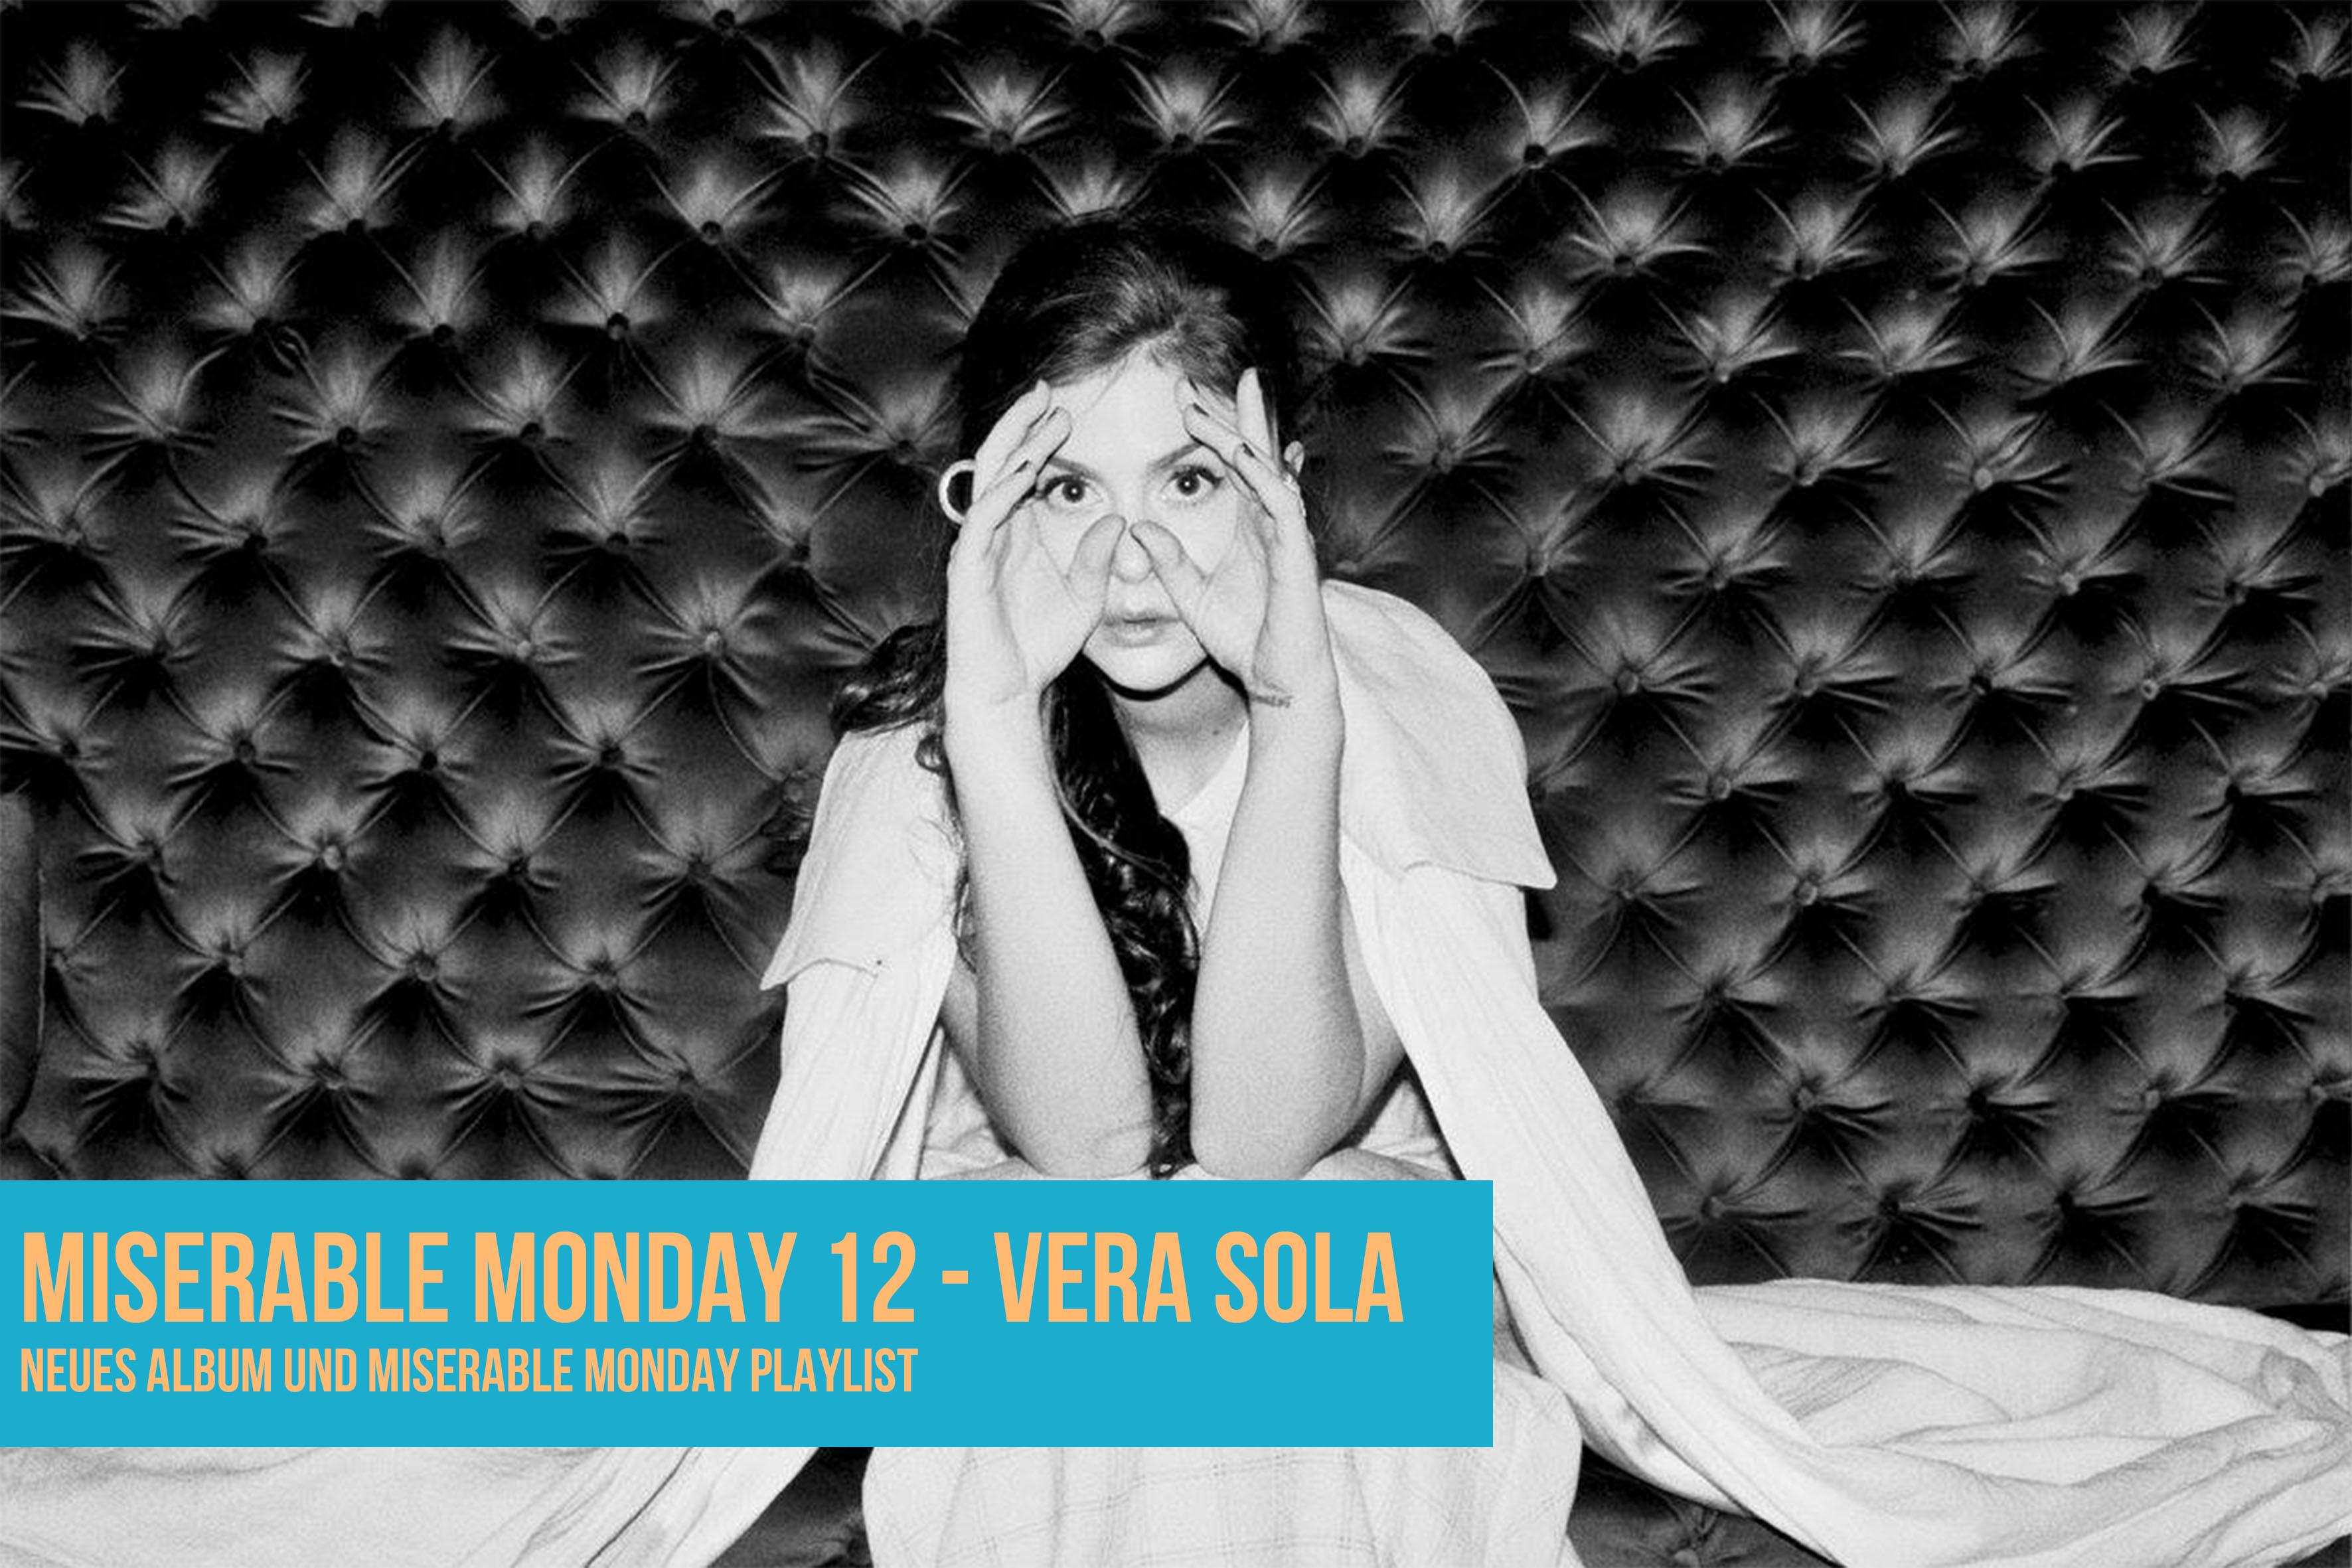 012 - Vera Sola